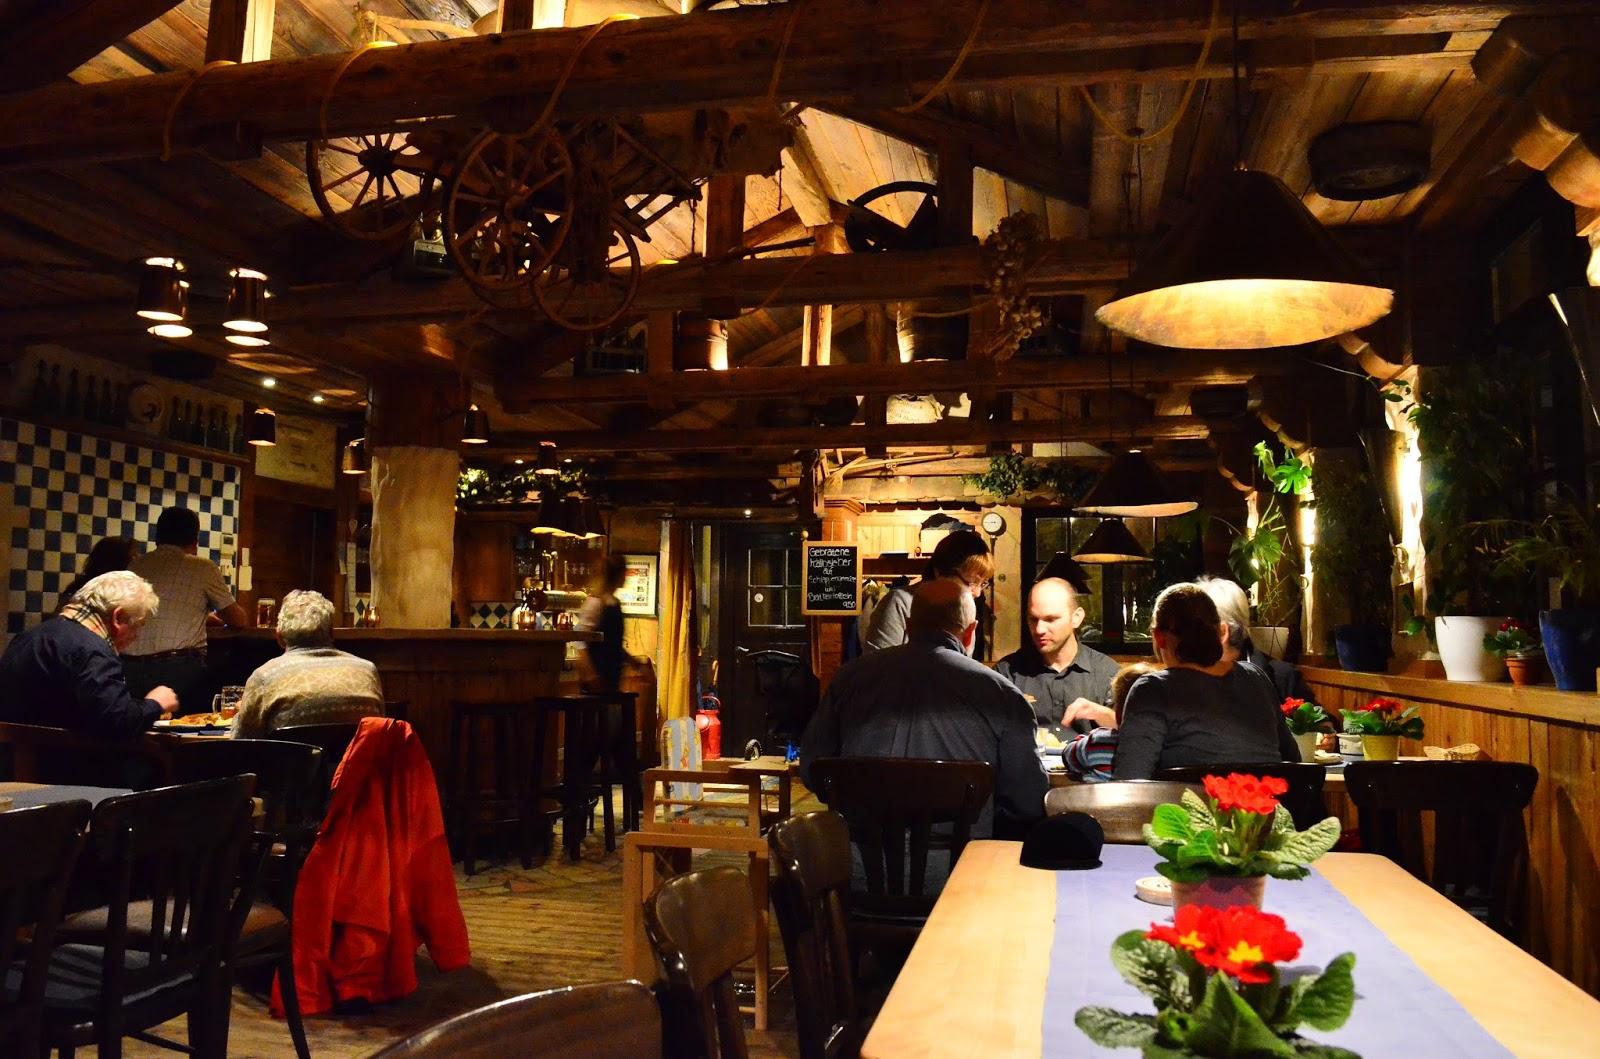 Traduction tabouret de bar en anglais - Tabouret de bar en anglais ...